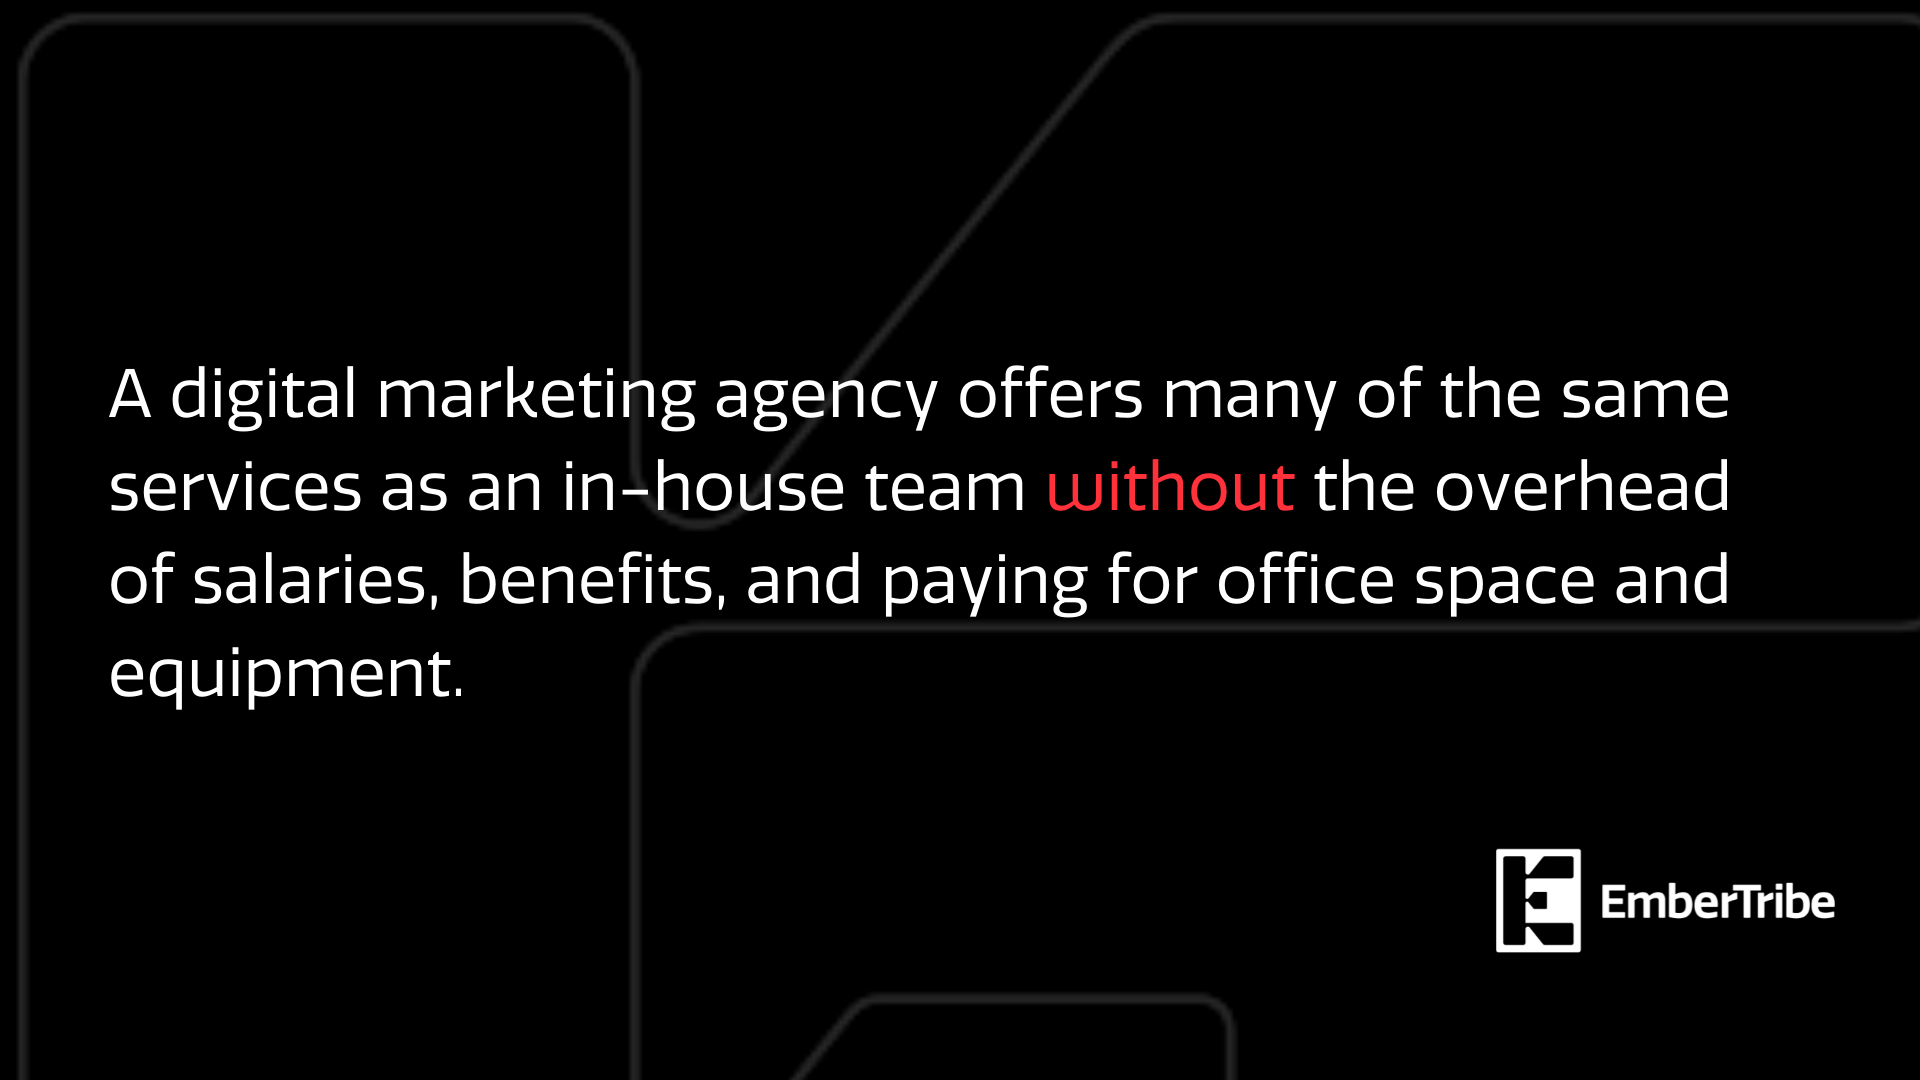 Full-service digital marketing agency offers